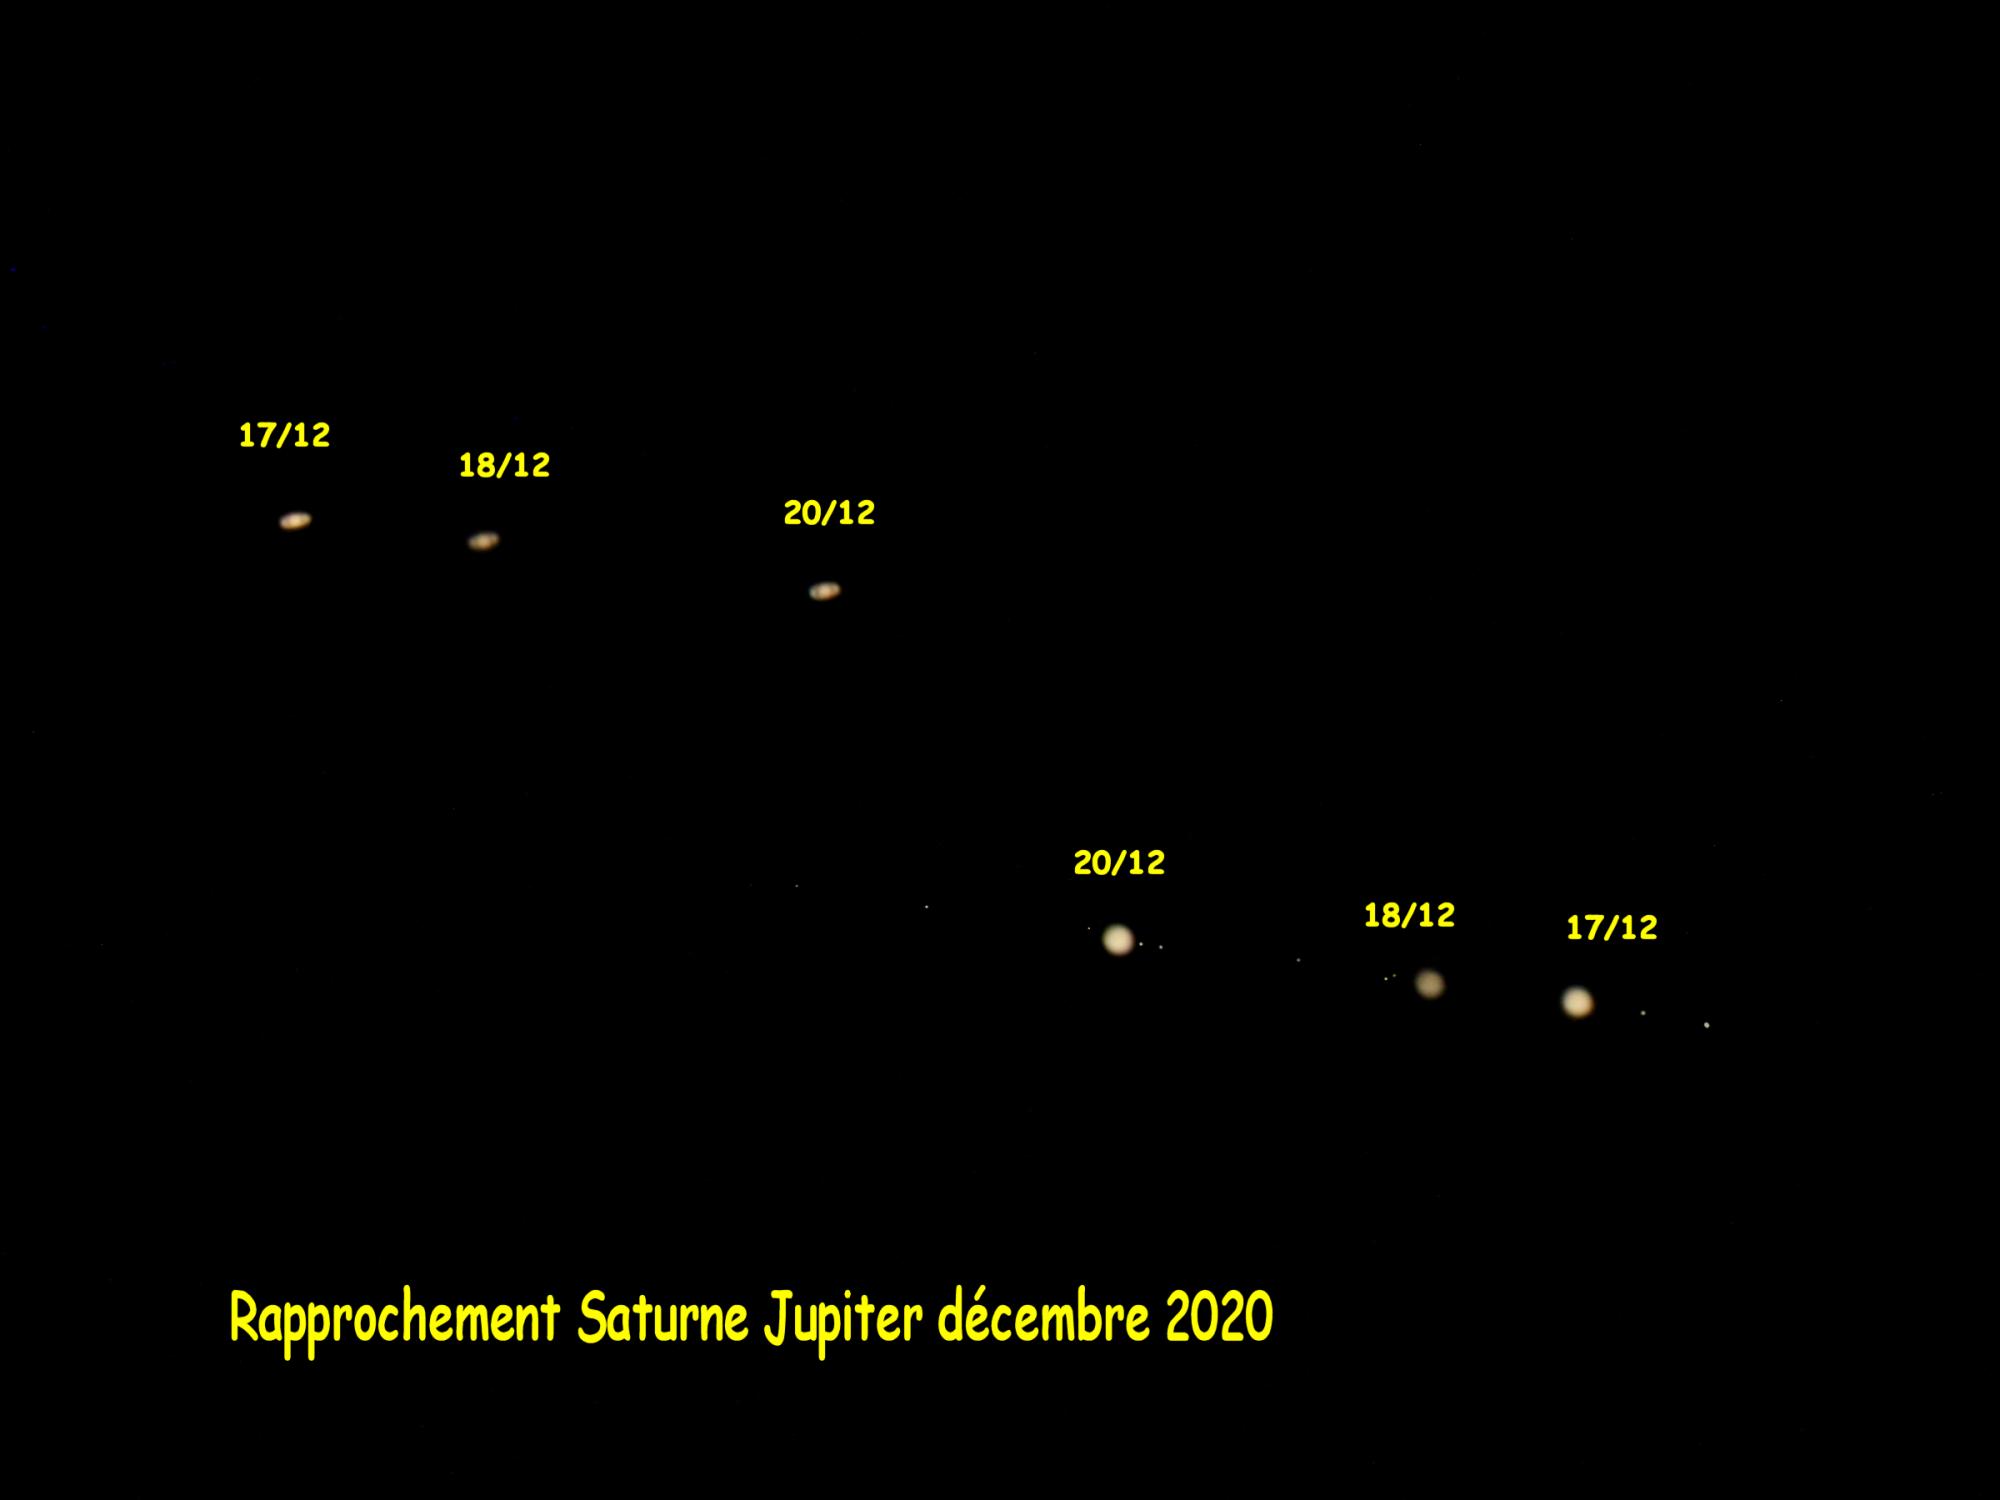 SaturneJuju17-18-20_12_2020.thumb.png.87e9dbcf50a4f87faaee8e6832861fd6.png